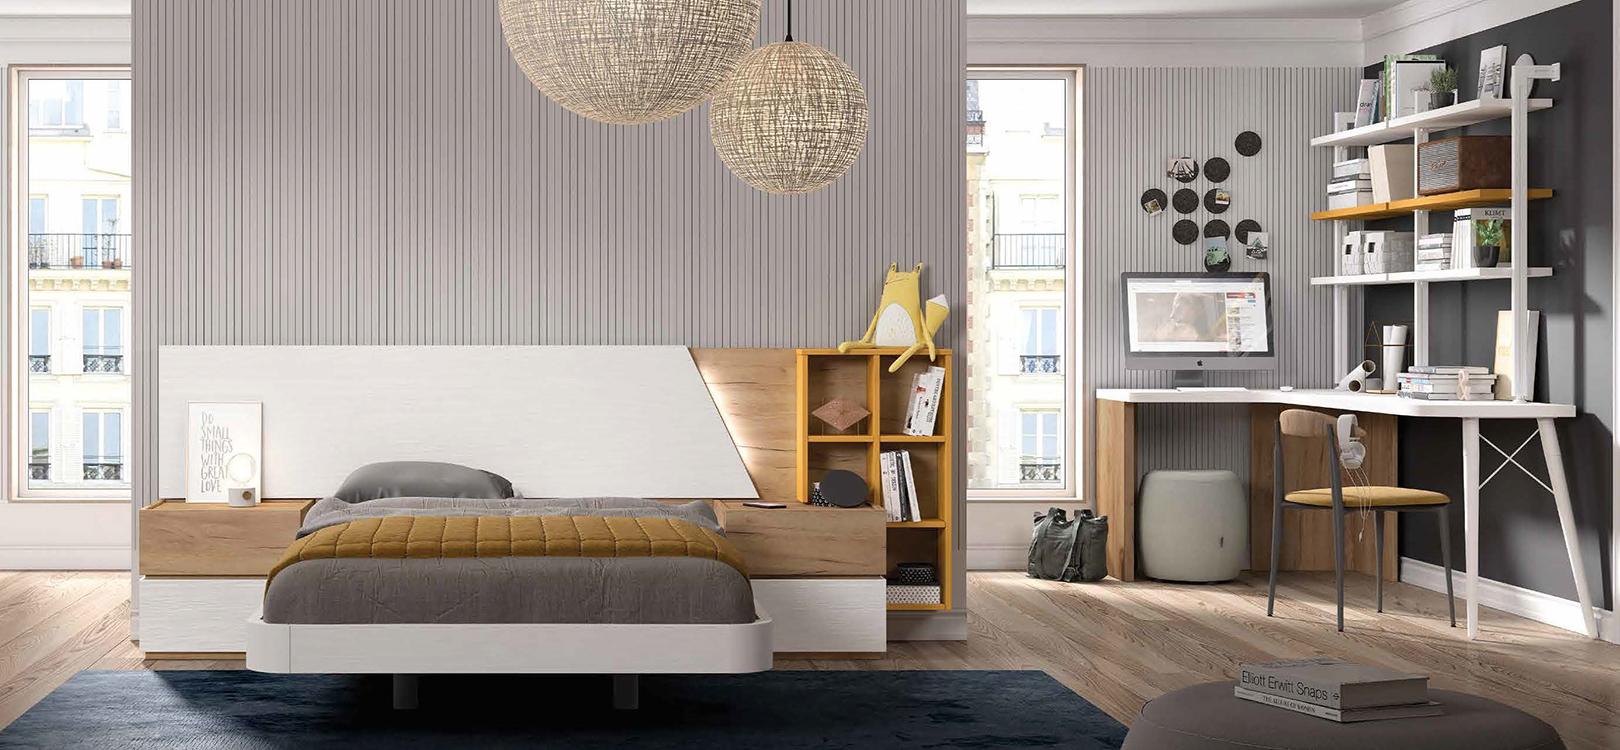 http://www.munozmuebles.net/nueva/catalogo/juveniles-modulares.html - Comprar  muebles que sobresalen